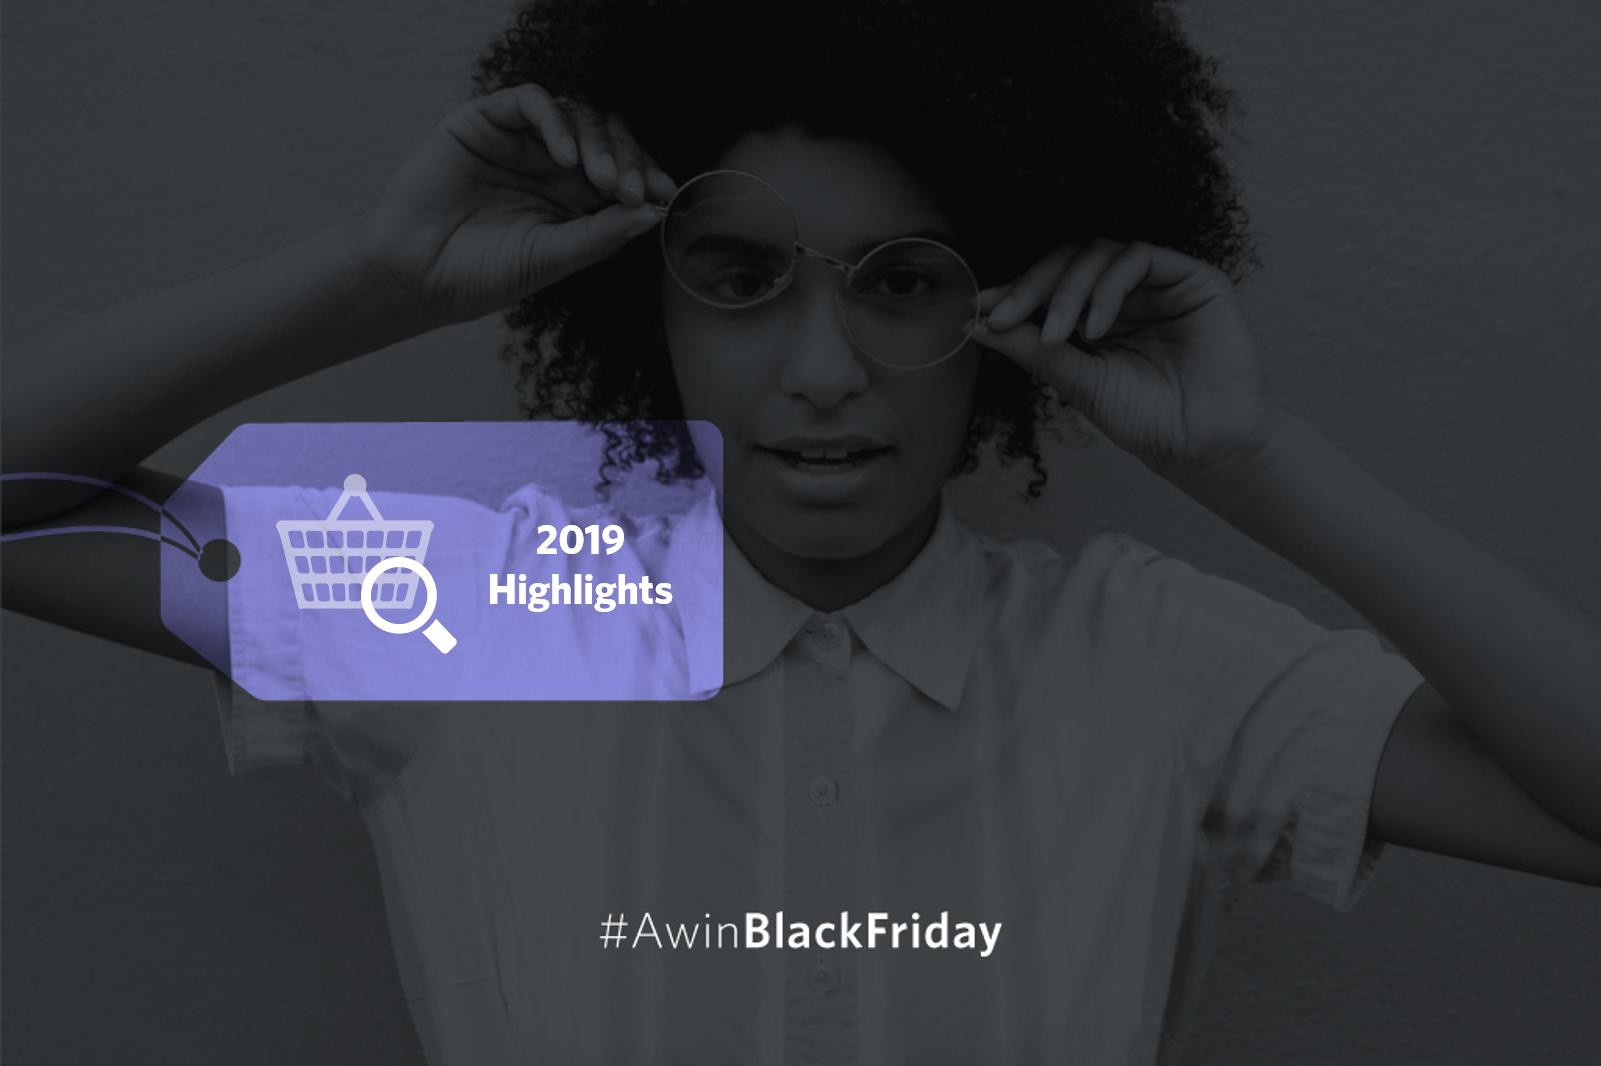 Destaques da Black Friday 2019